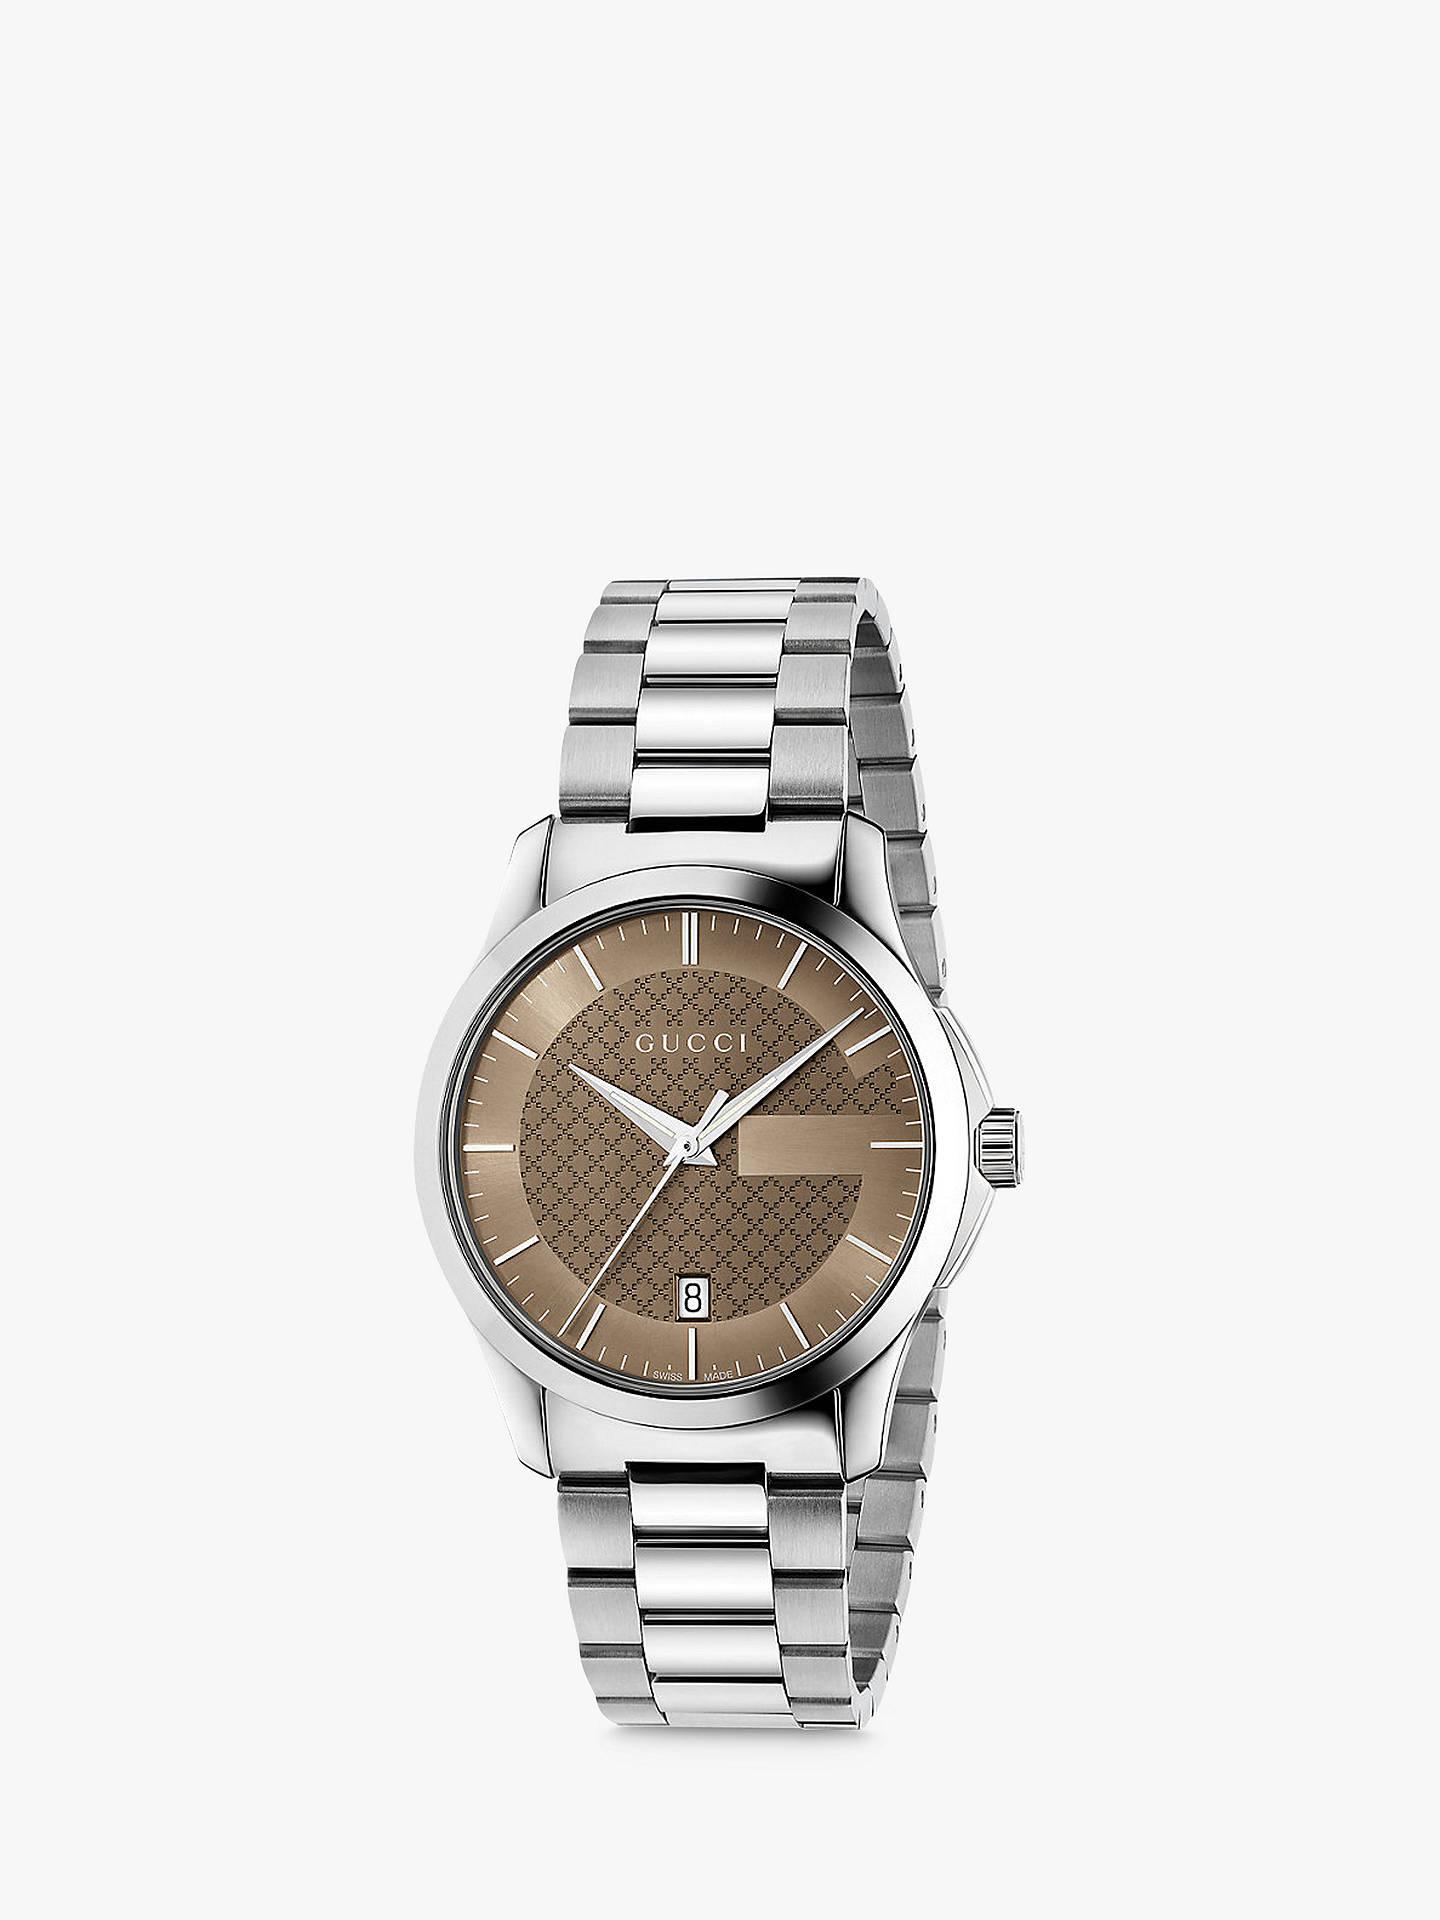 3596bfee681 Buy Gucci YA126445 Men s G-Timeless Date Bracelet Strap Watch